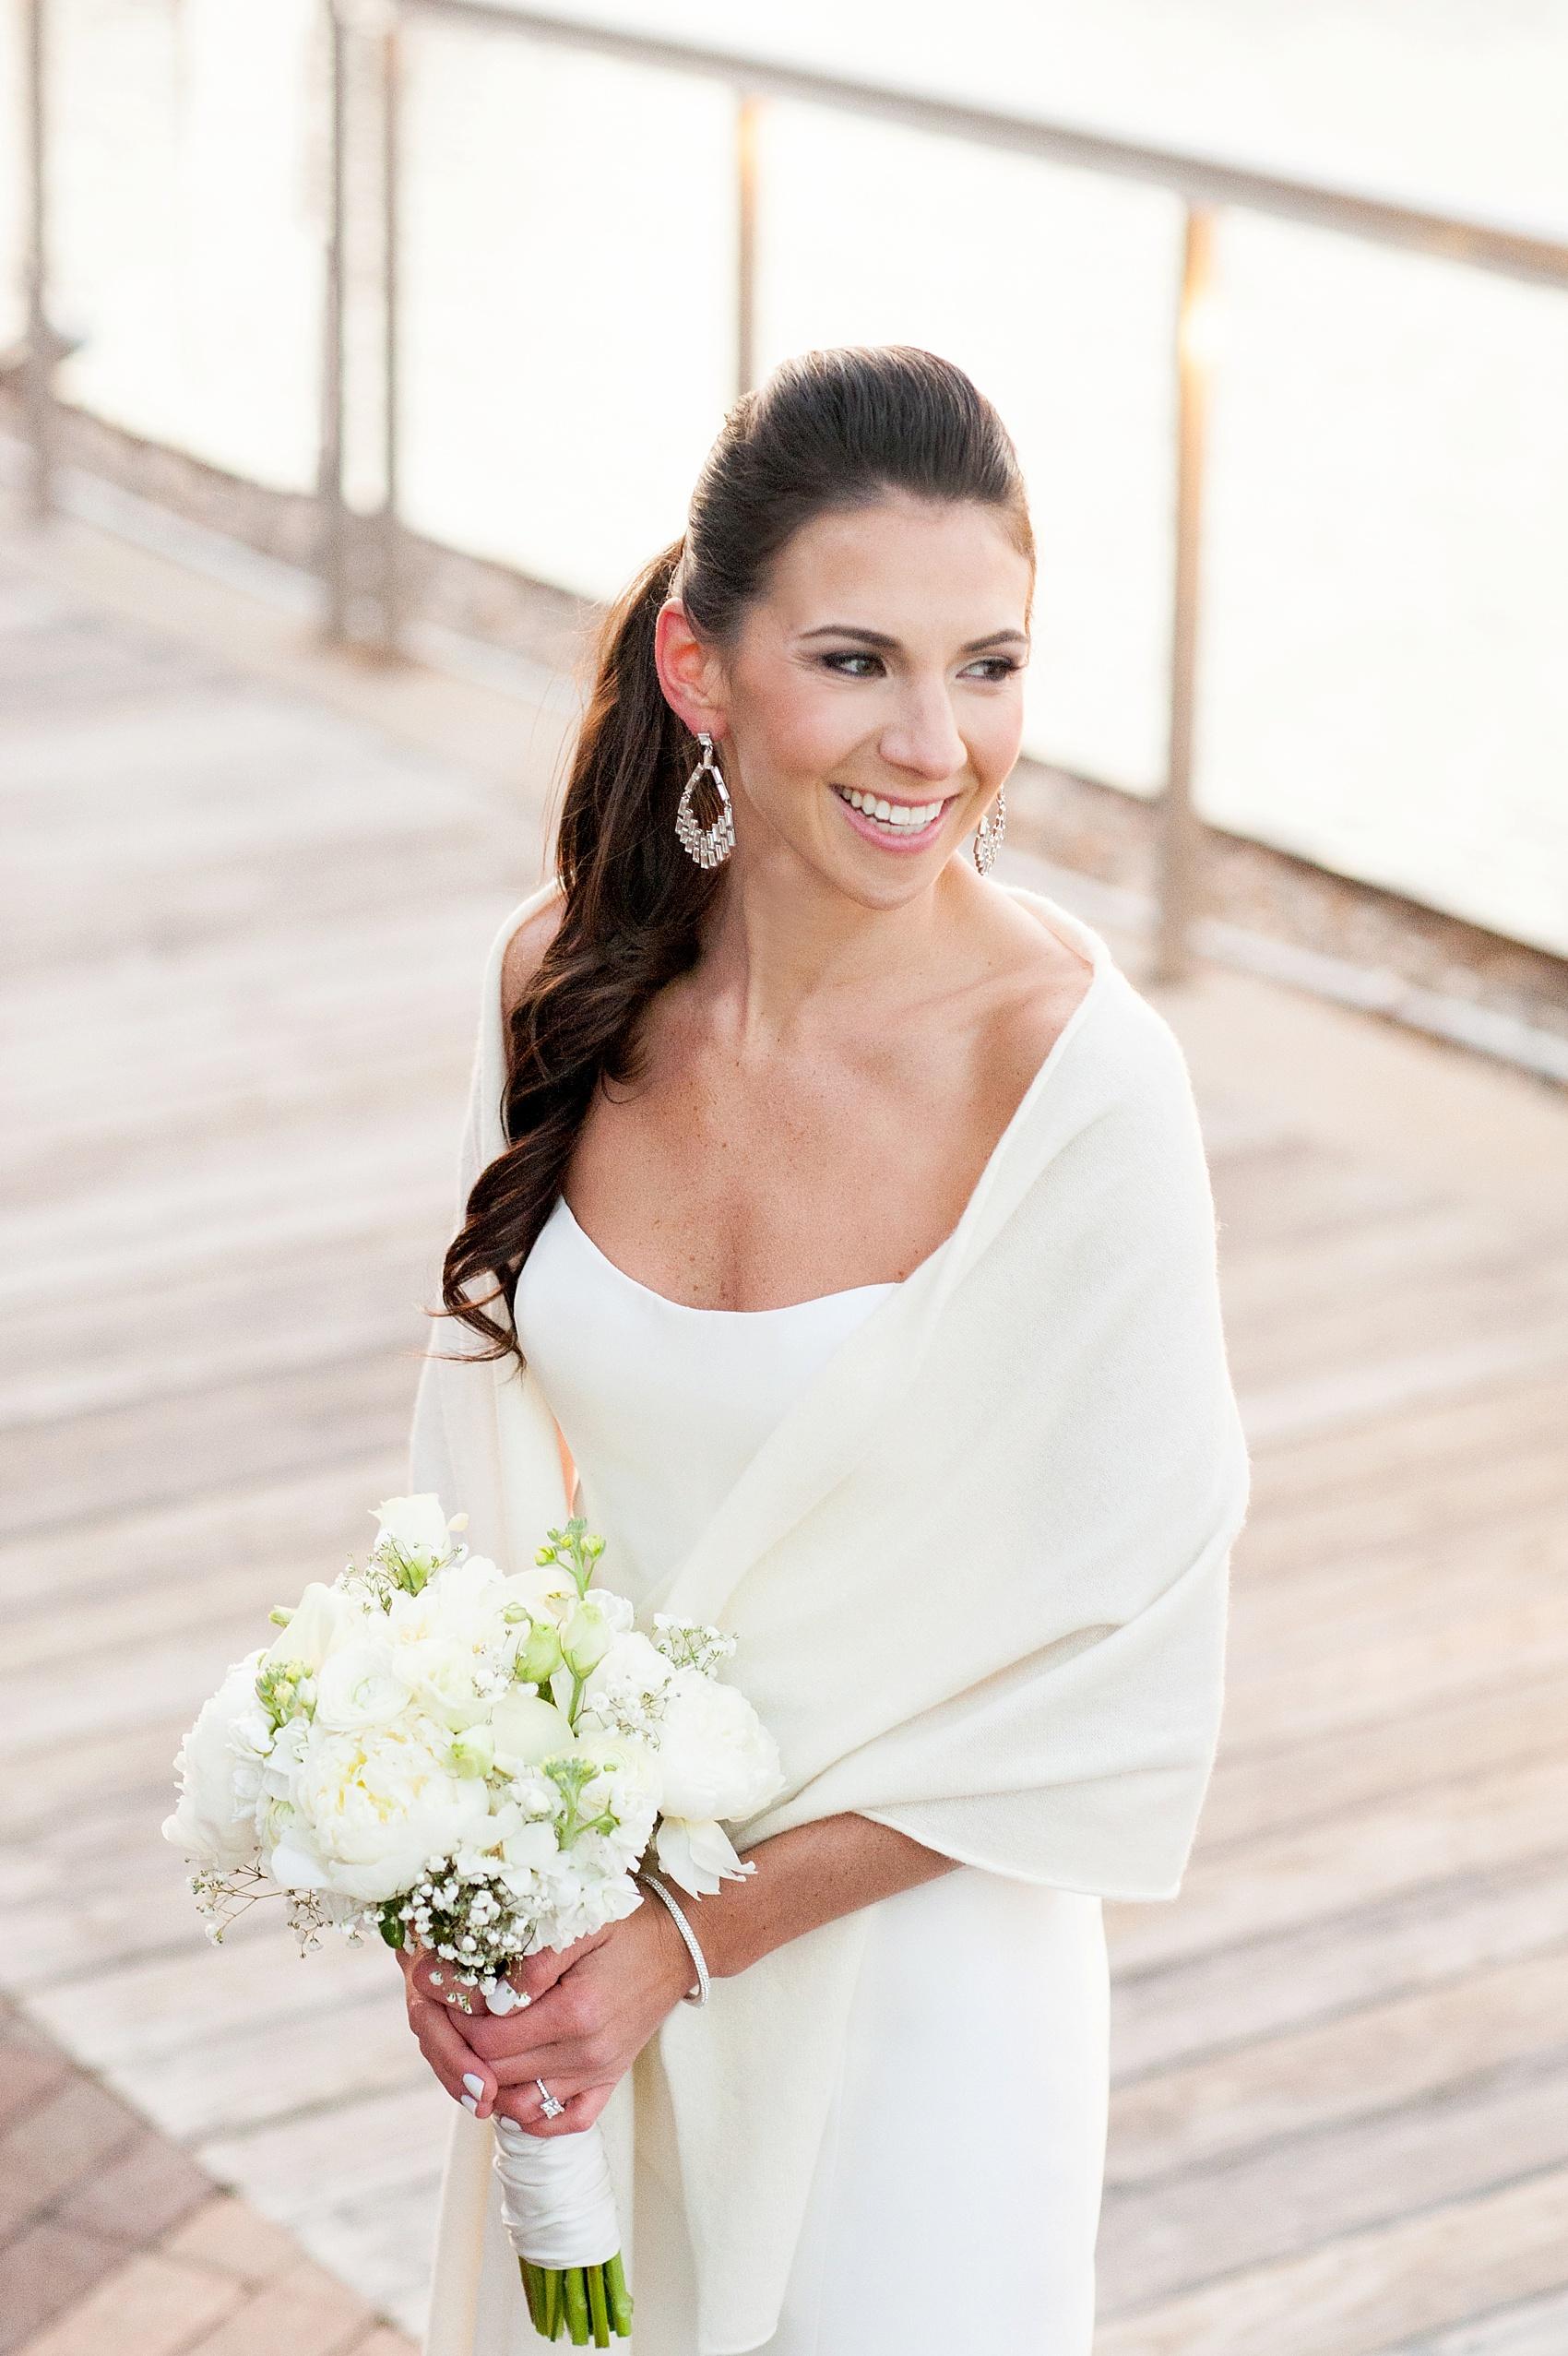 mikkelpaige-harbor_club_long_island-wedding_photographer-jen_dave_0070